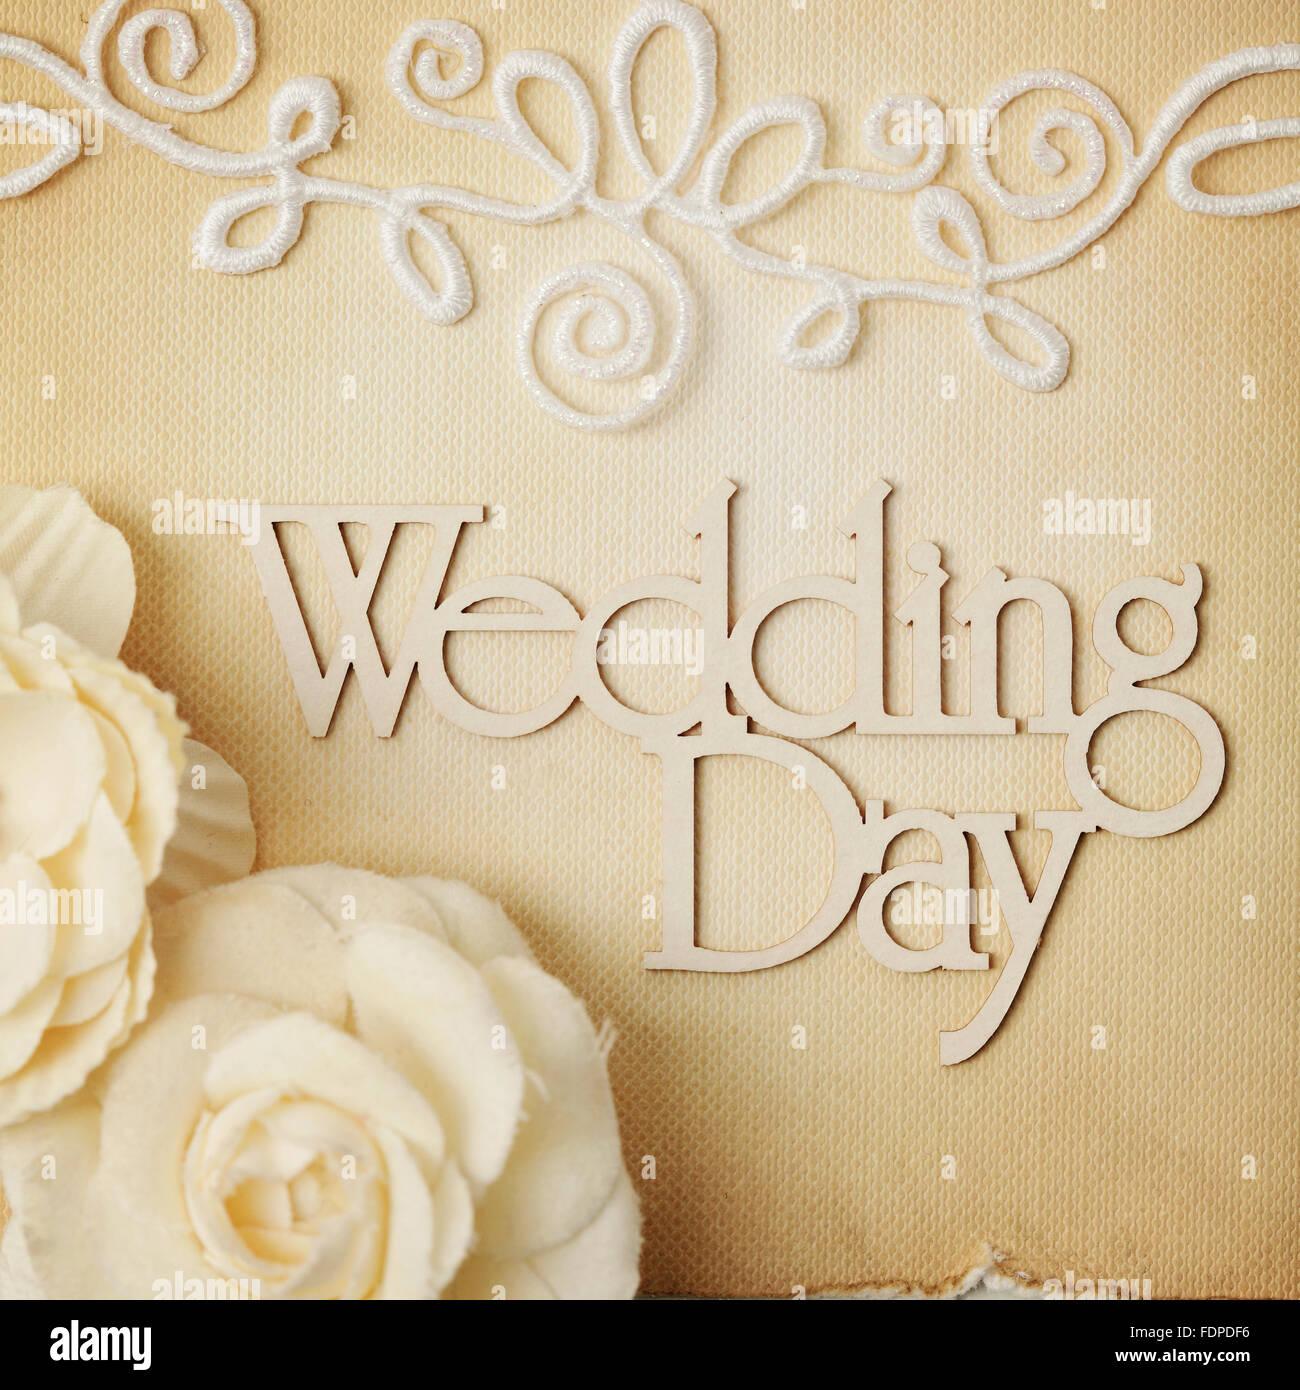 wedding,invitation,greeting card Stock Photo: 94535930 - Alamy